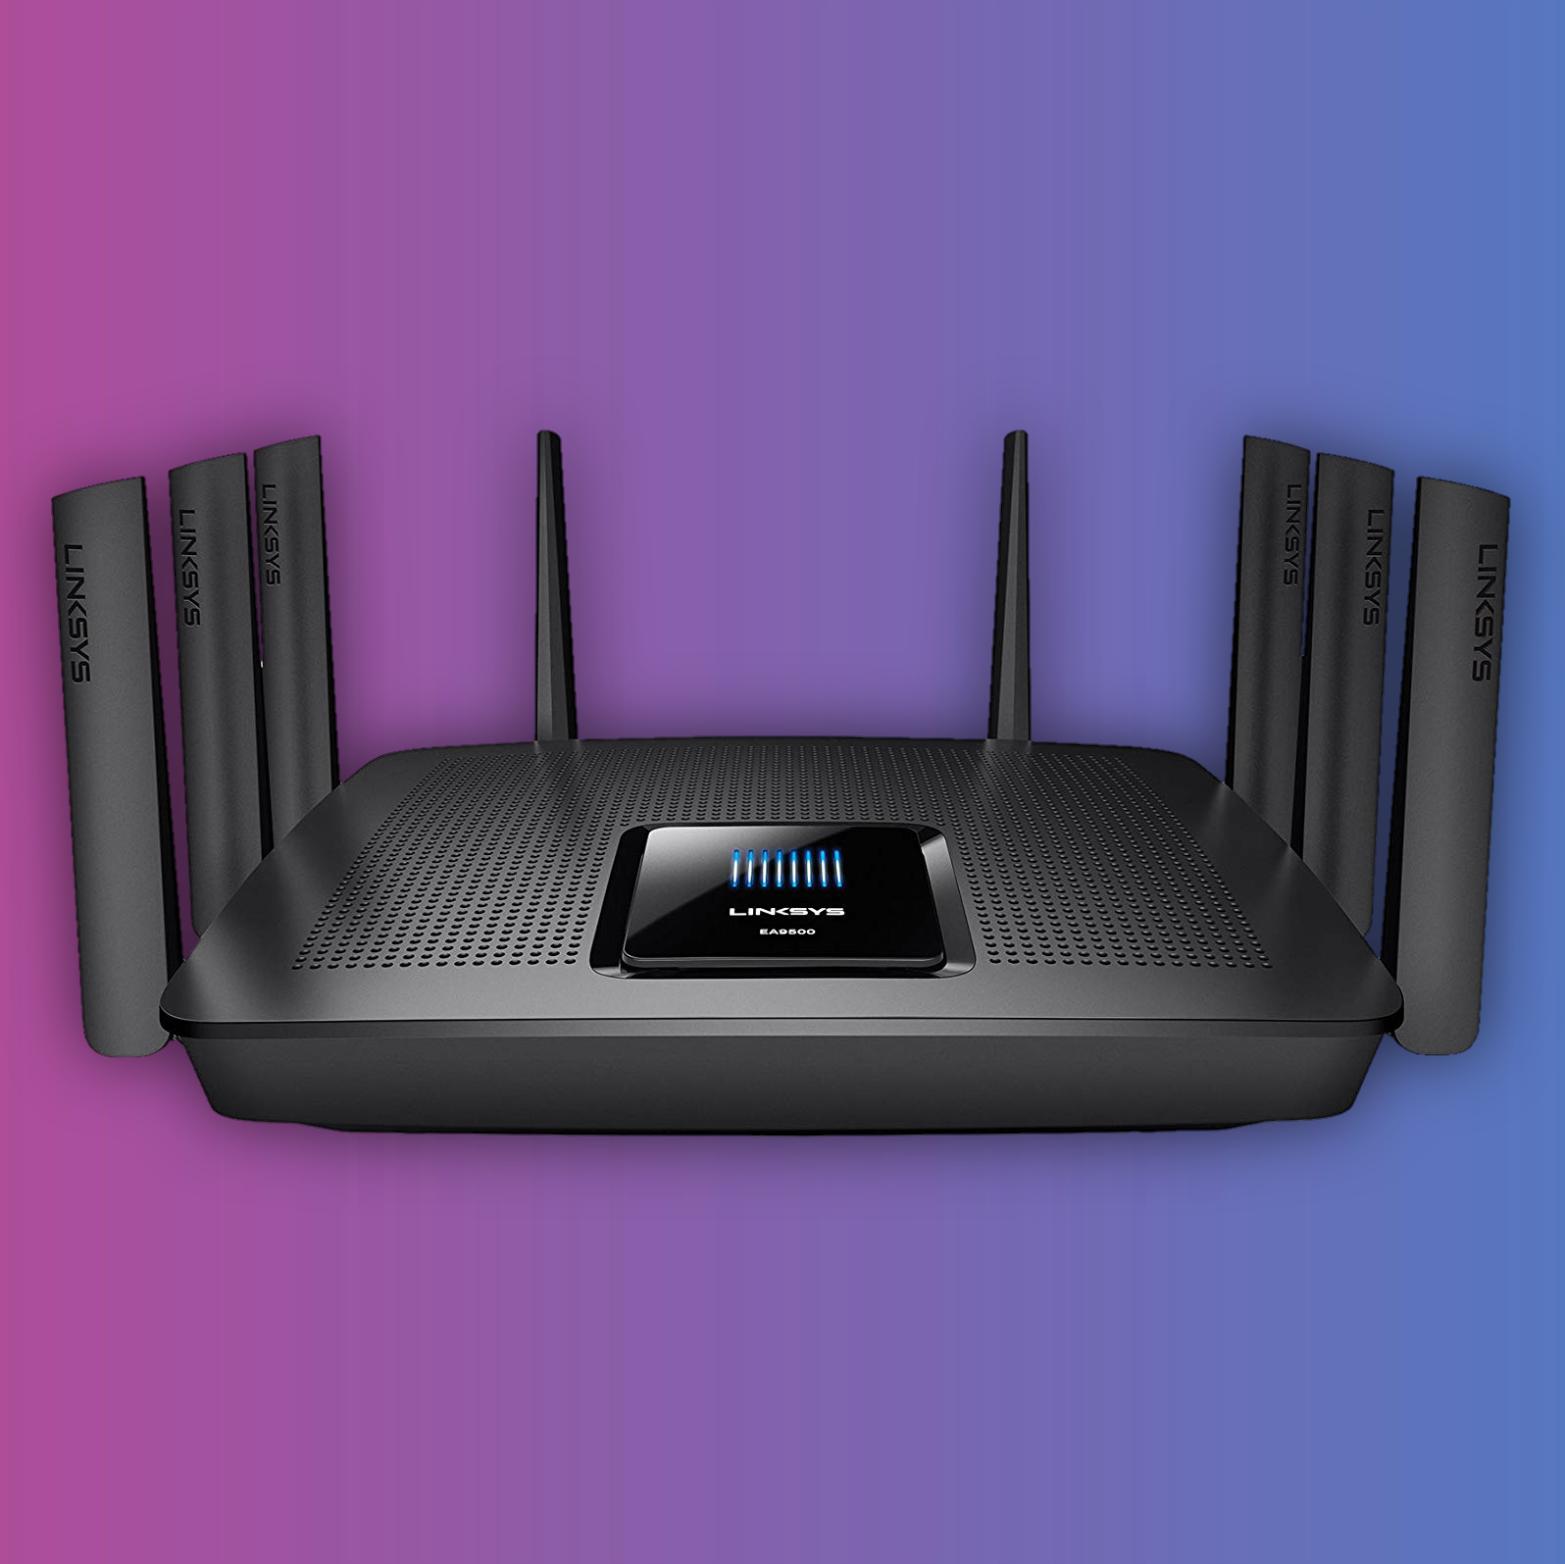 Linksys EA9500 AC5400: WiFi Router (Tri-Band, 1,4GHz Prozessor, 8 Gigabit Anschlüsse, 8 Antennen)